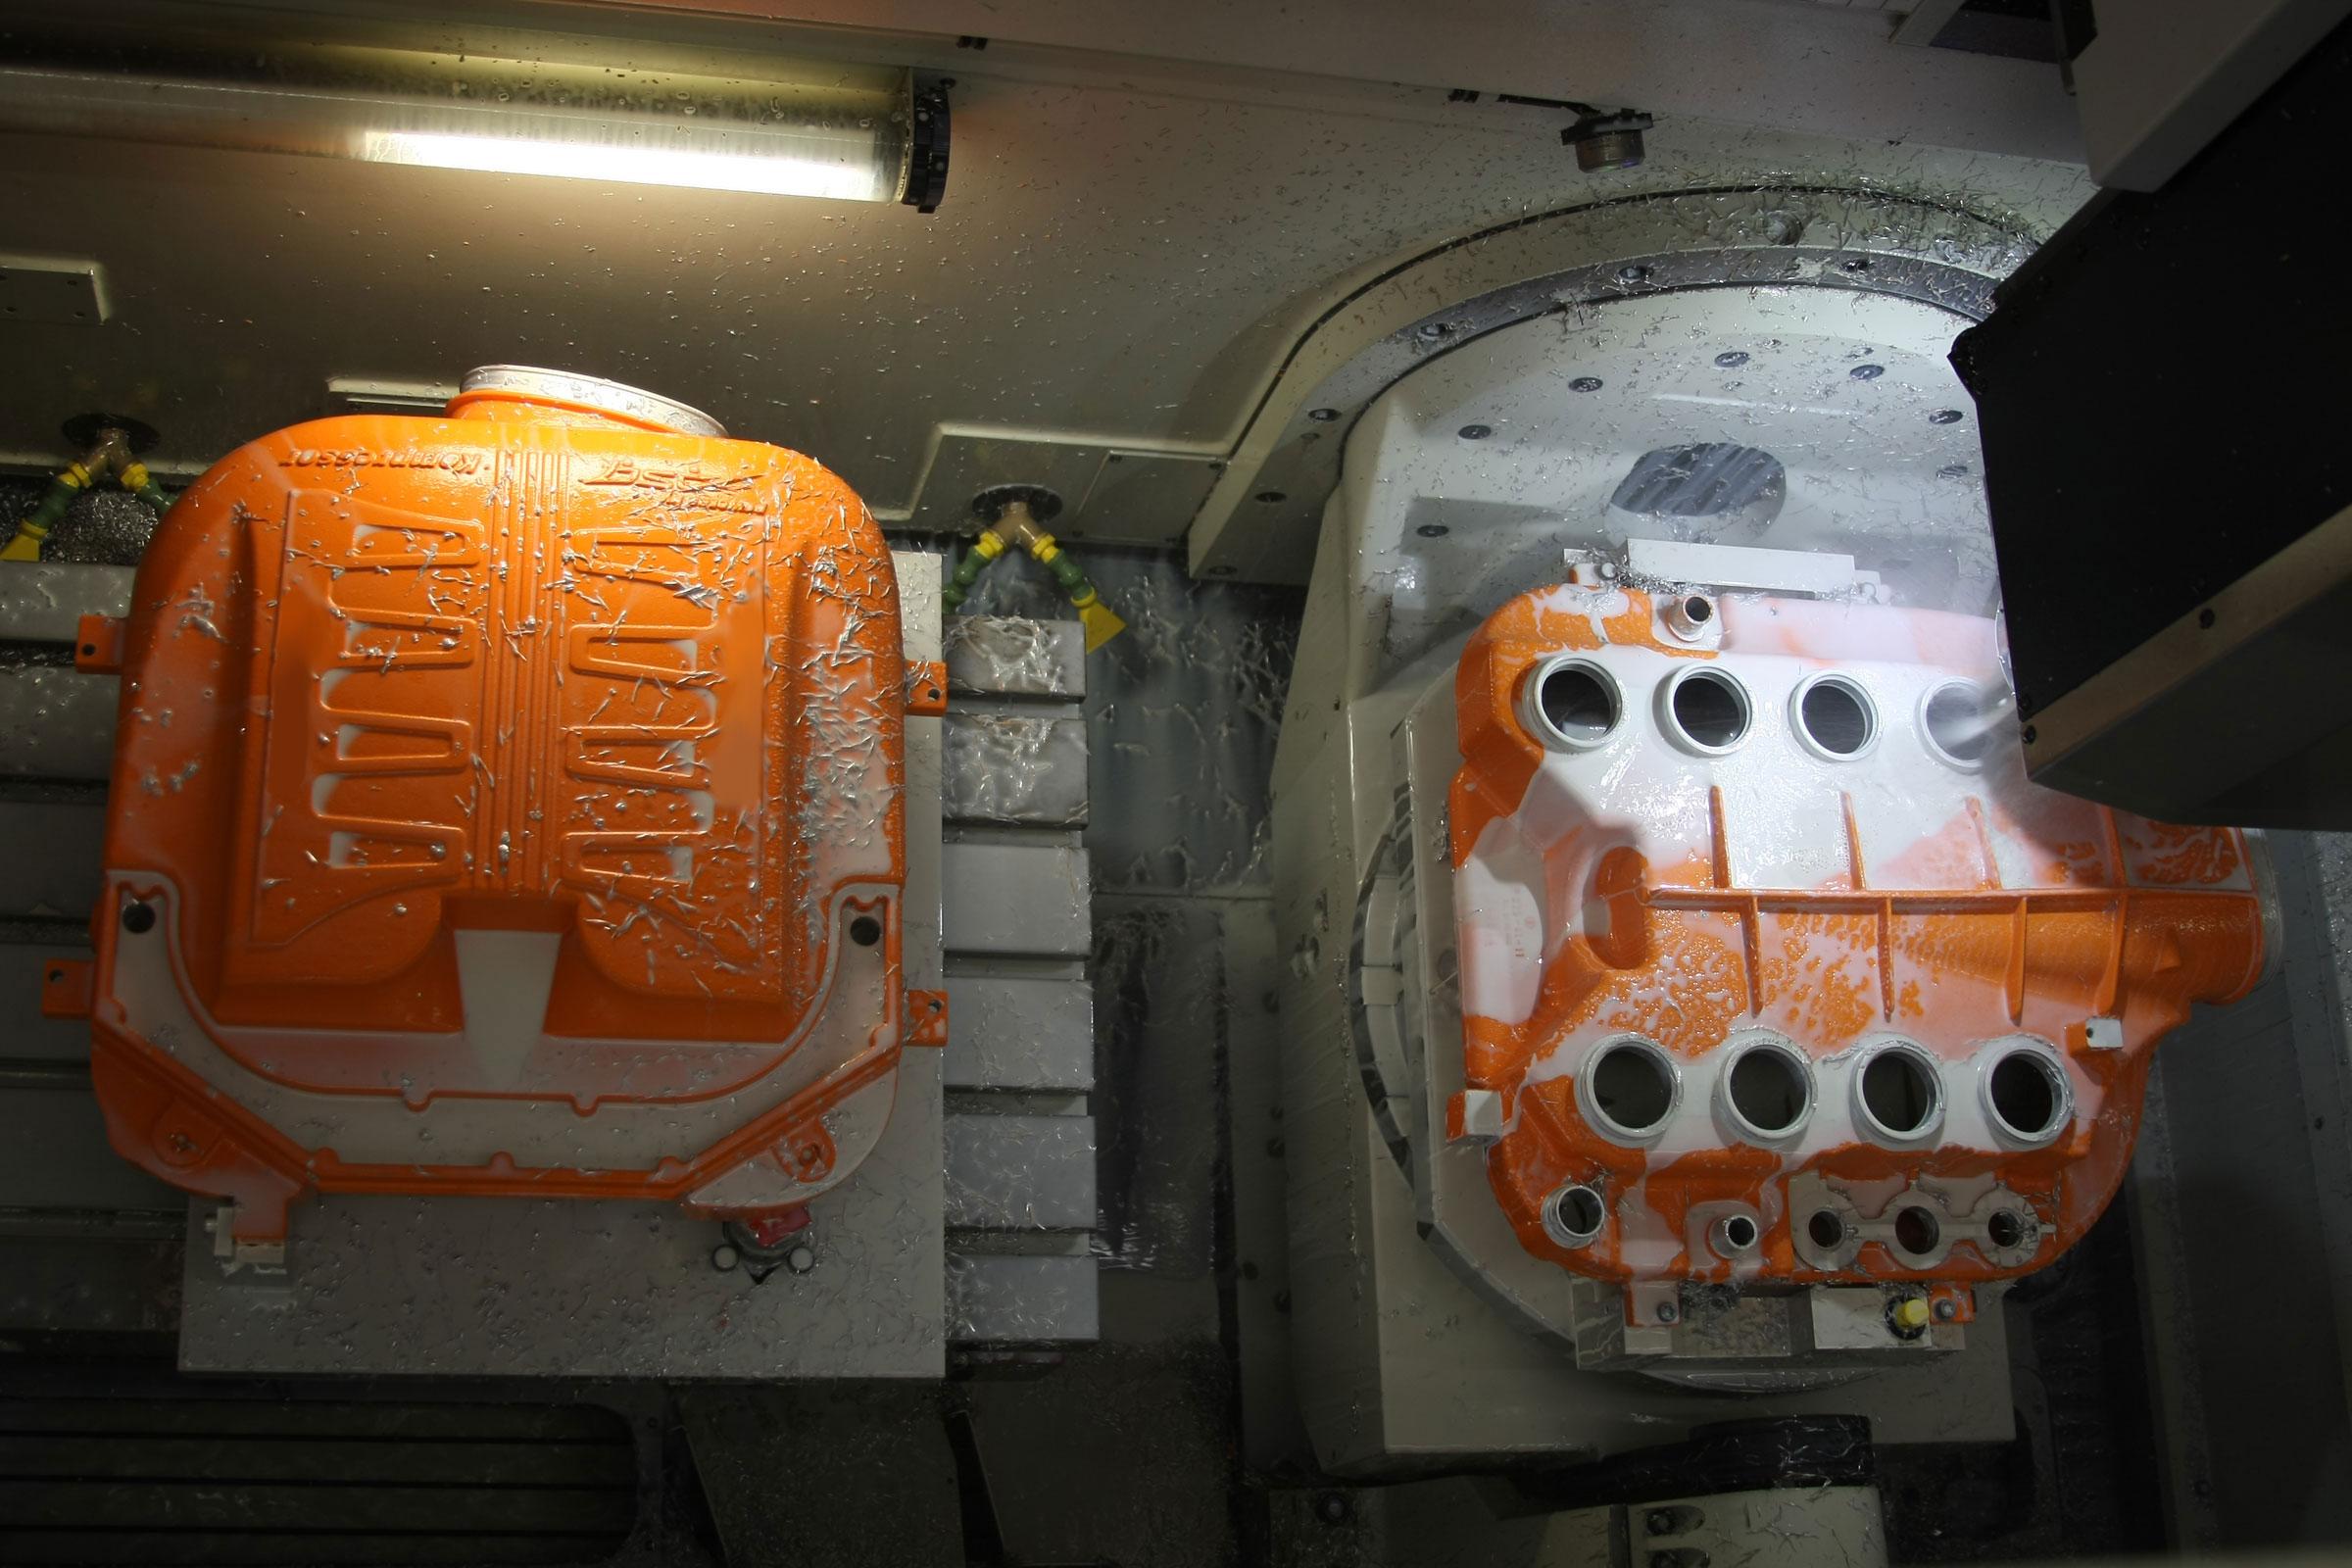 SK1 FE1- 515 PS<span> BMW M3 E9x V8 Kompressor</span>